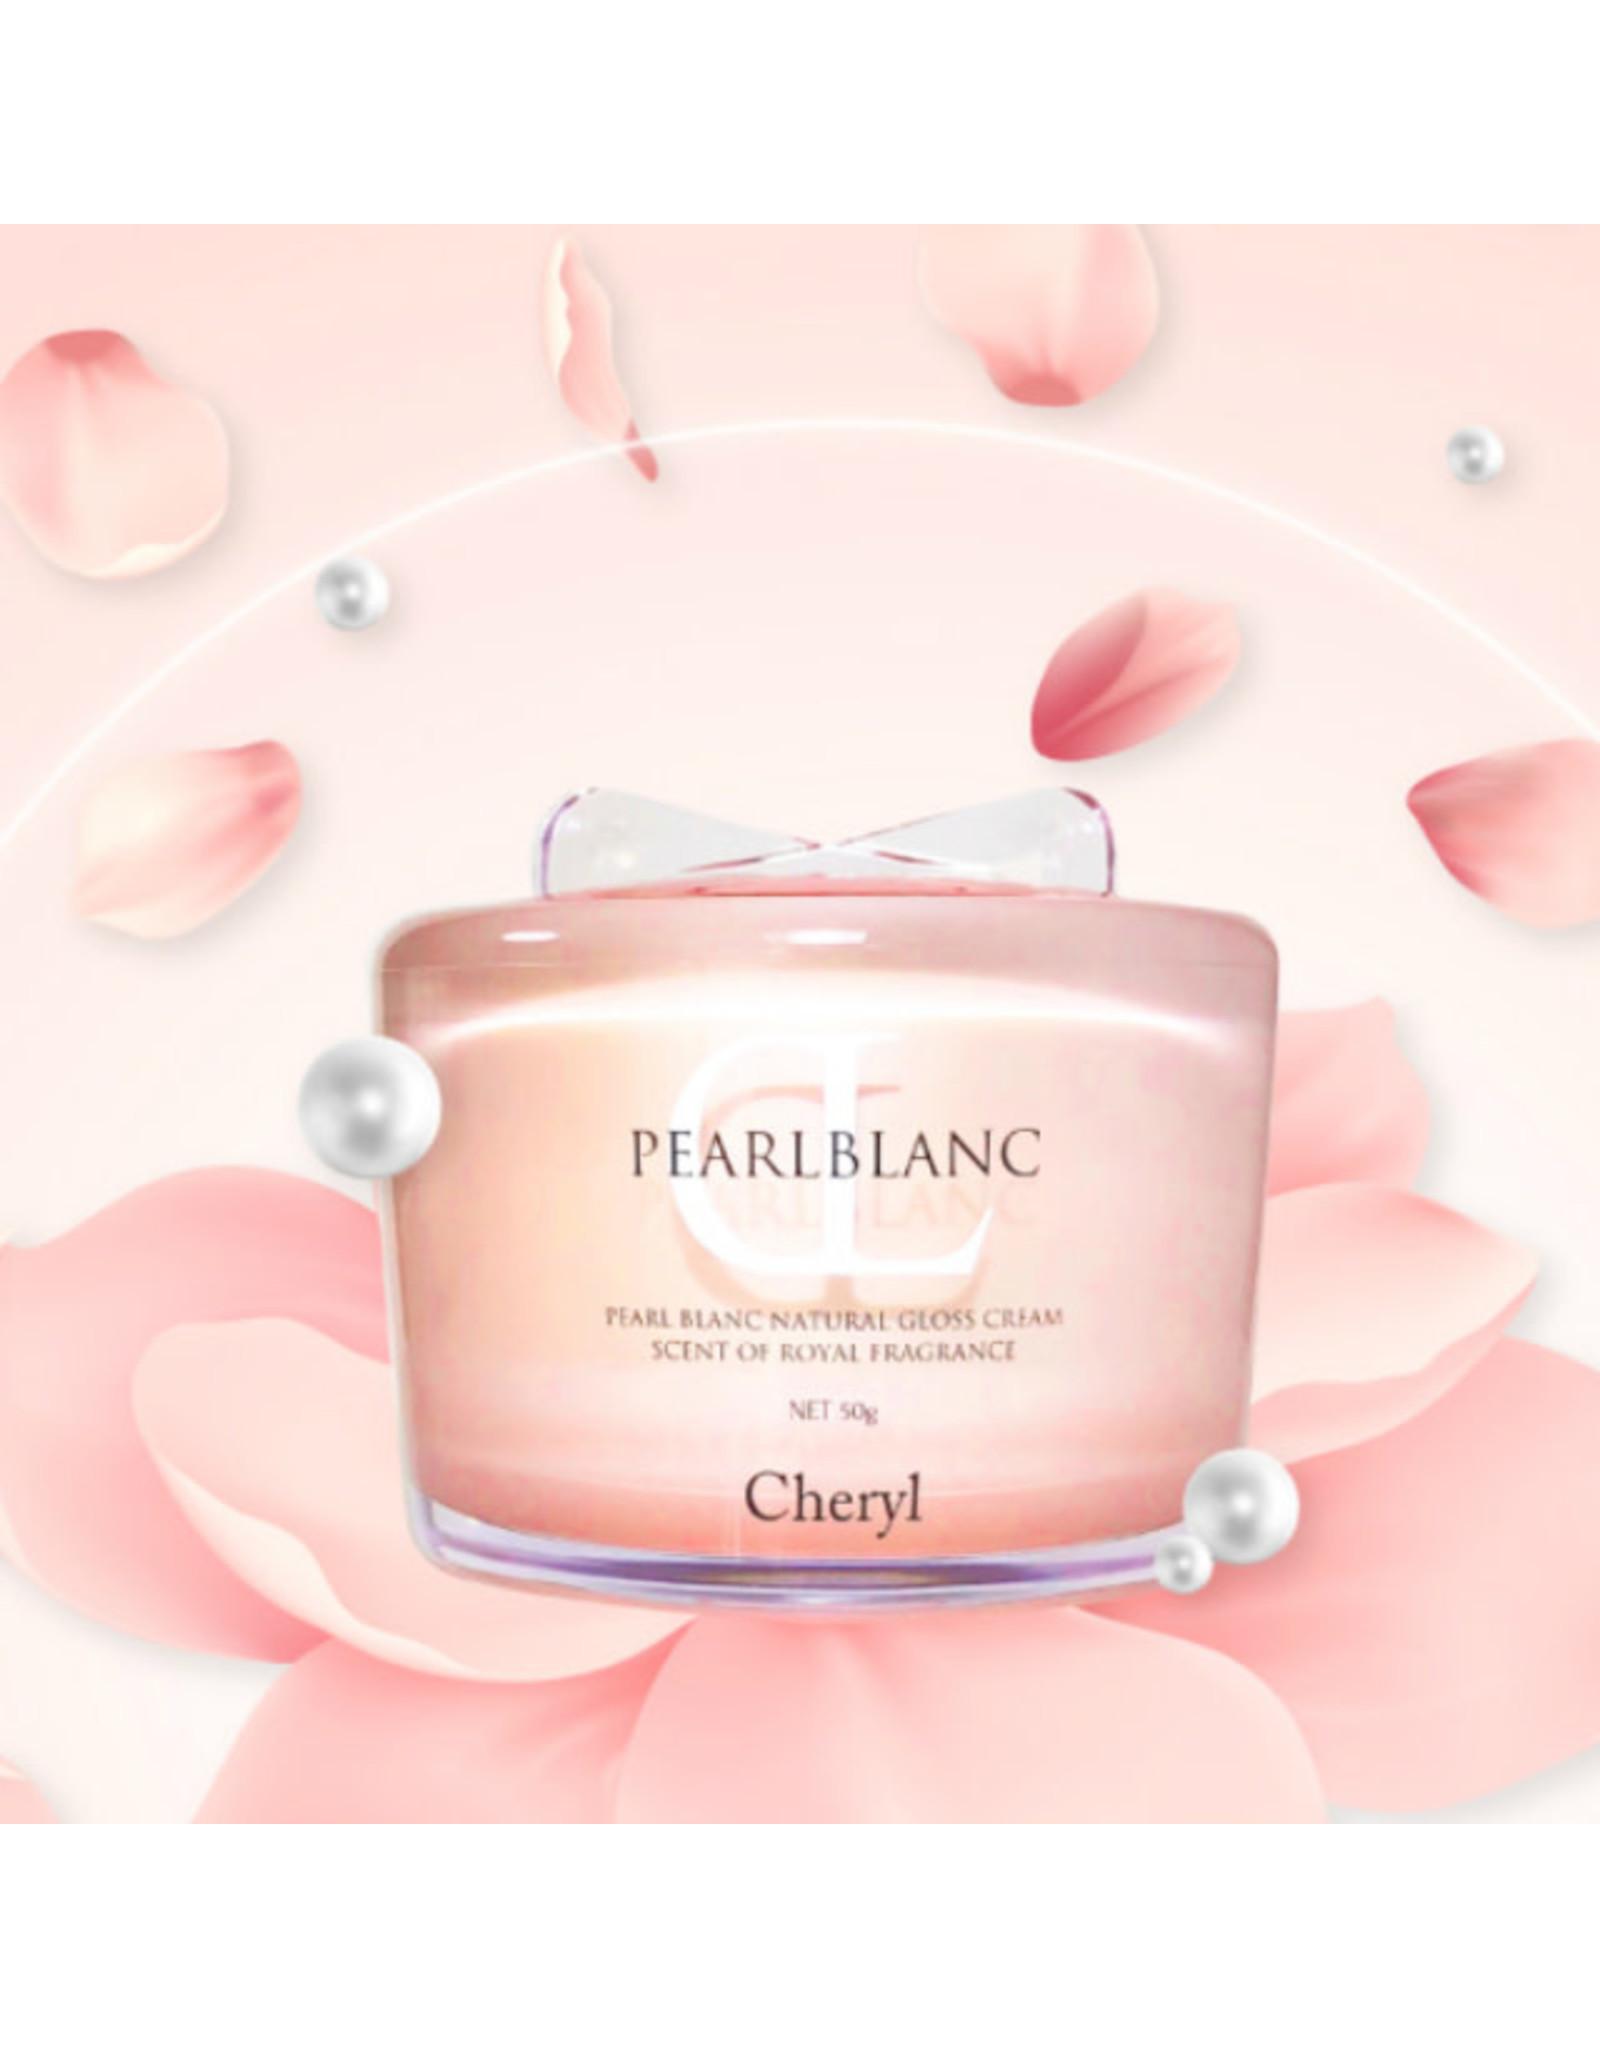 Cheryl Pearl Blanc Sakura Cream 50g